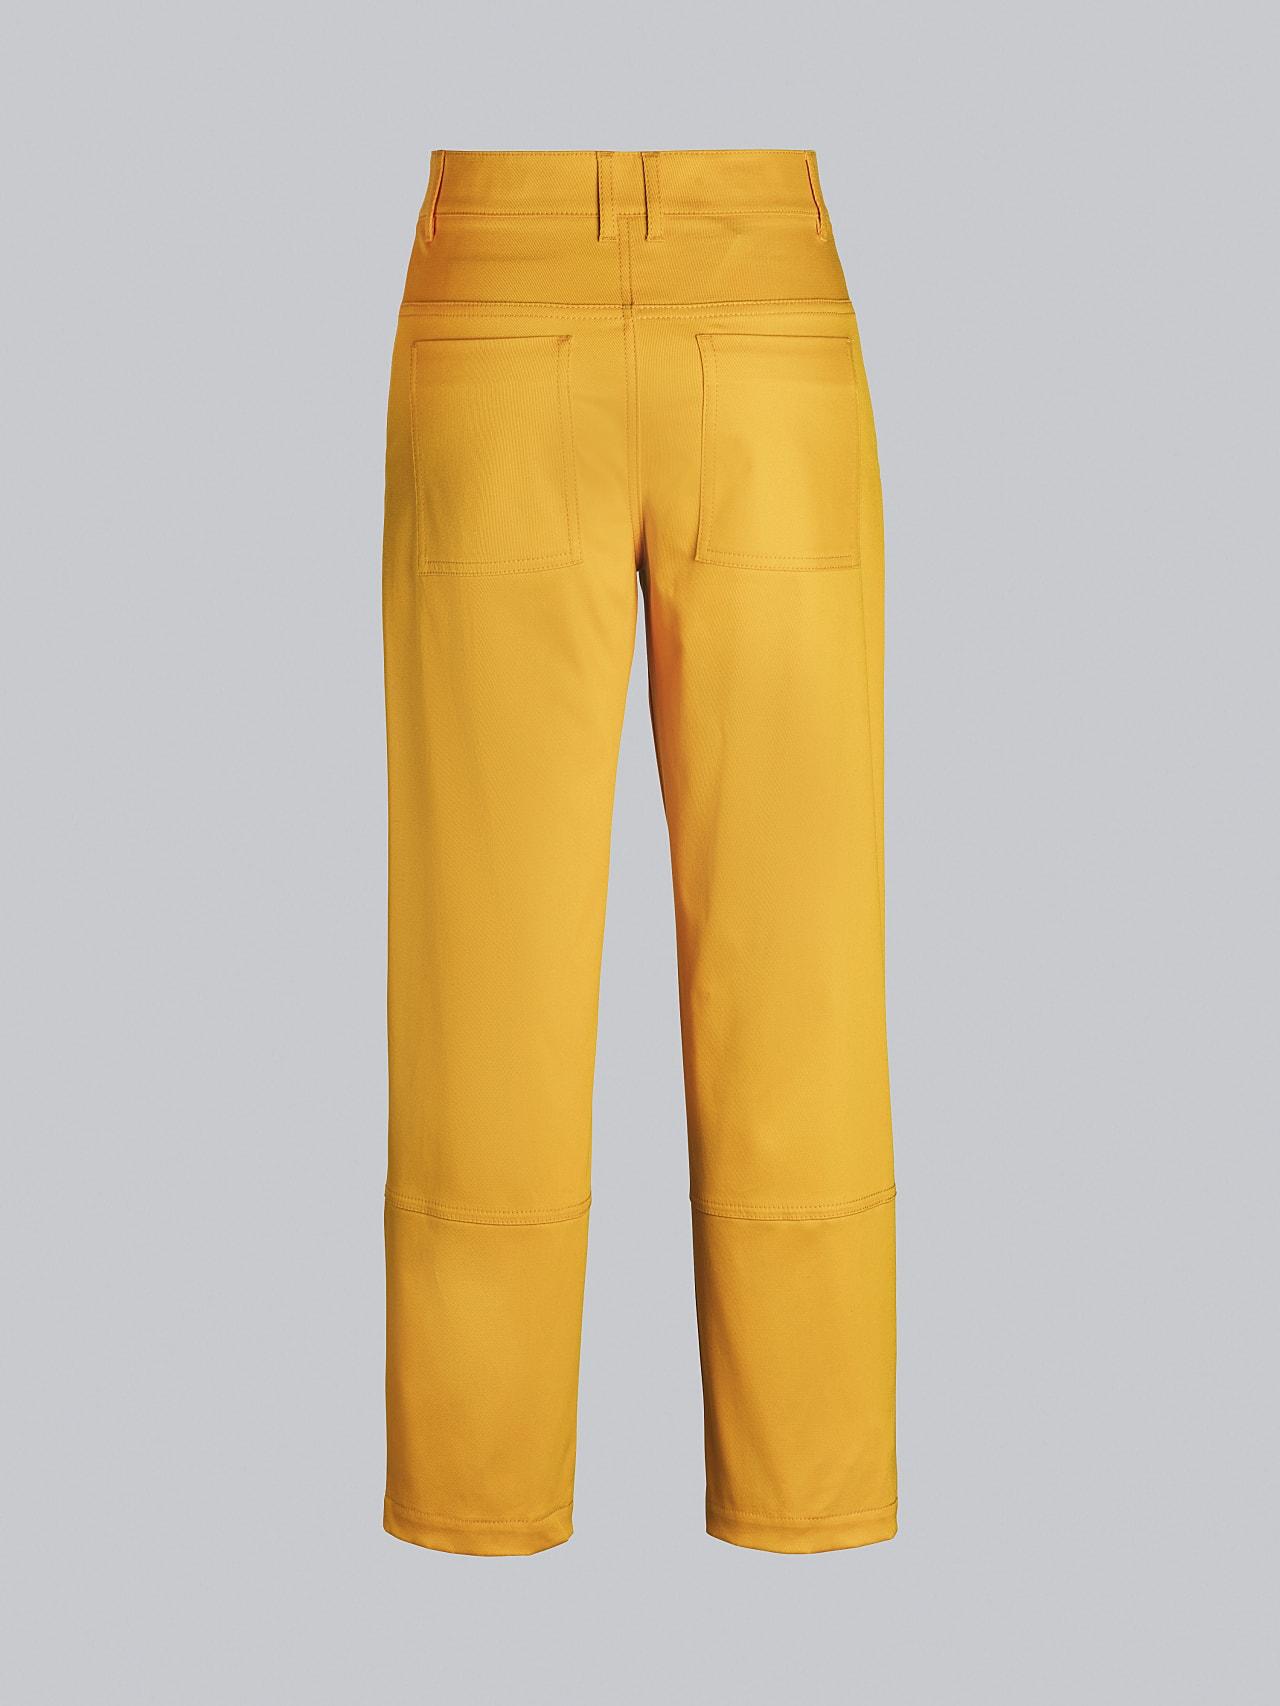 PCHAR V1.Y5.02 Tapered Barrel-Leg Pants yellow Left Alpha Tauri